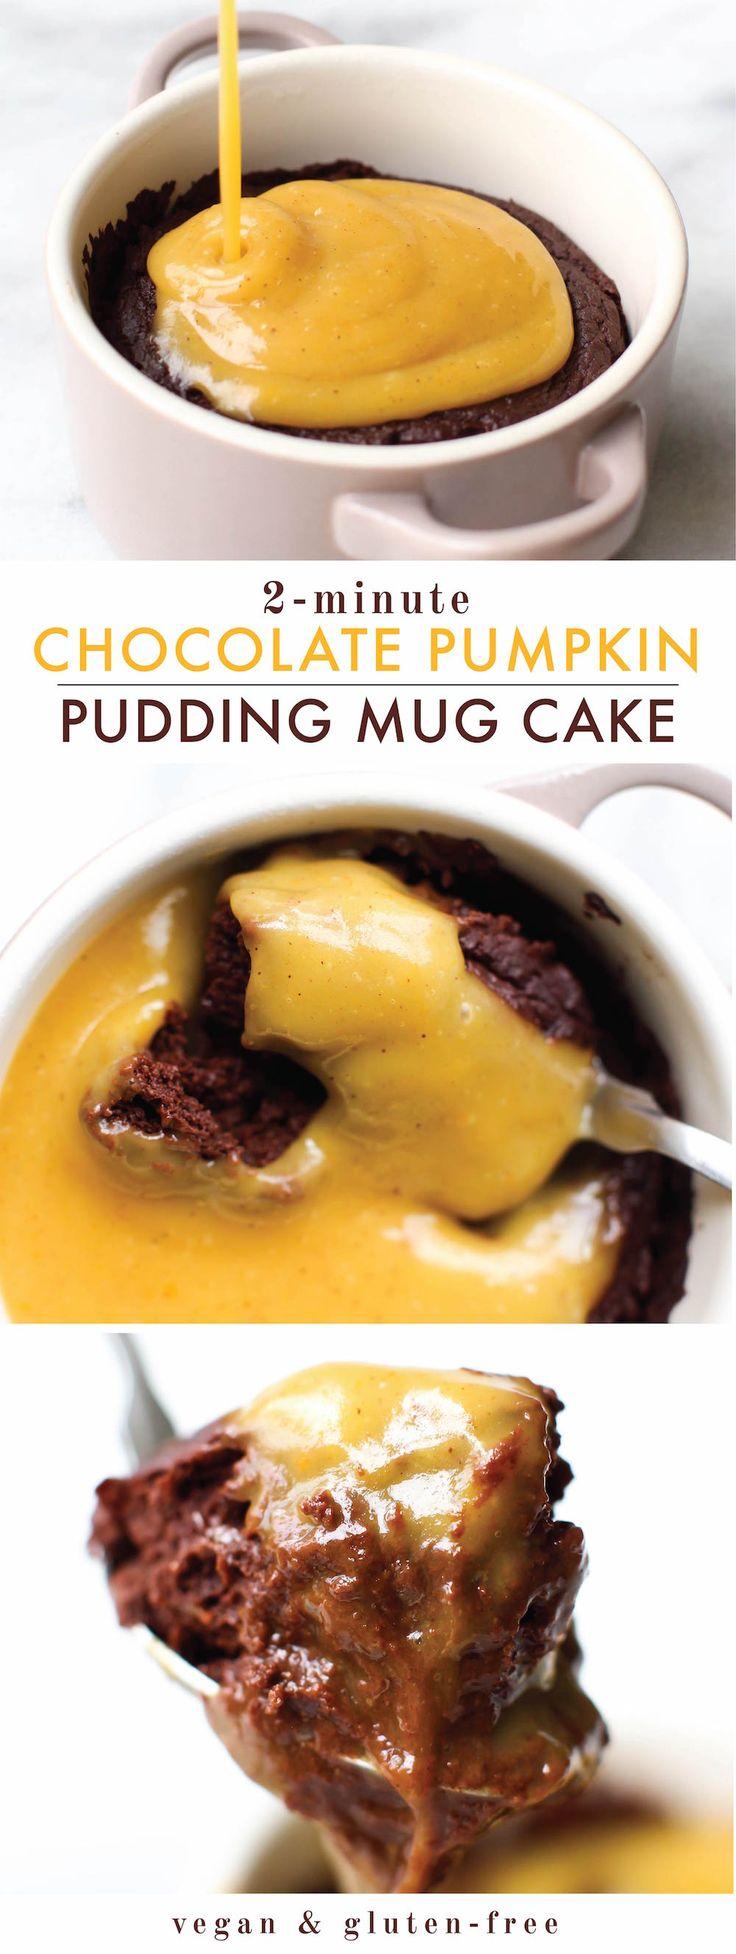 Gooey Chocolate Flourless Pudding Cake With Pumpkin Spice